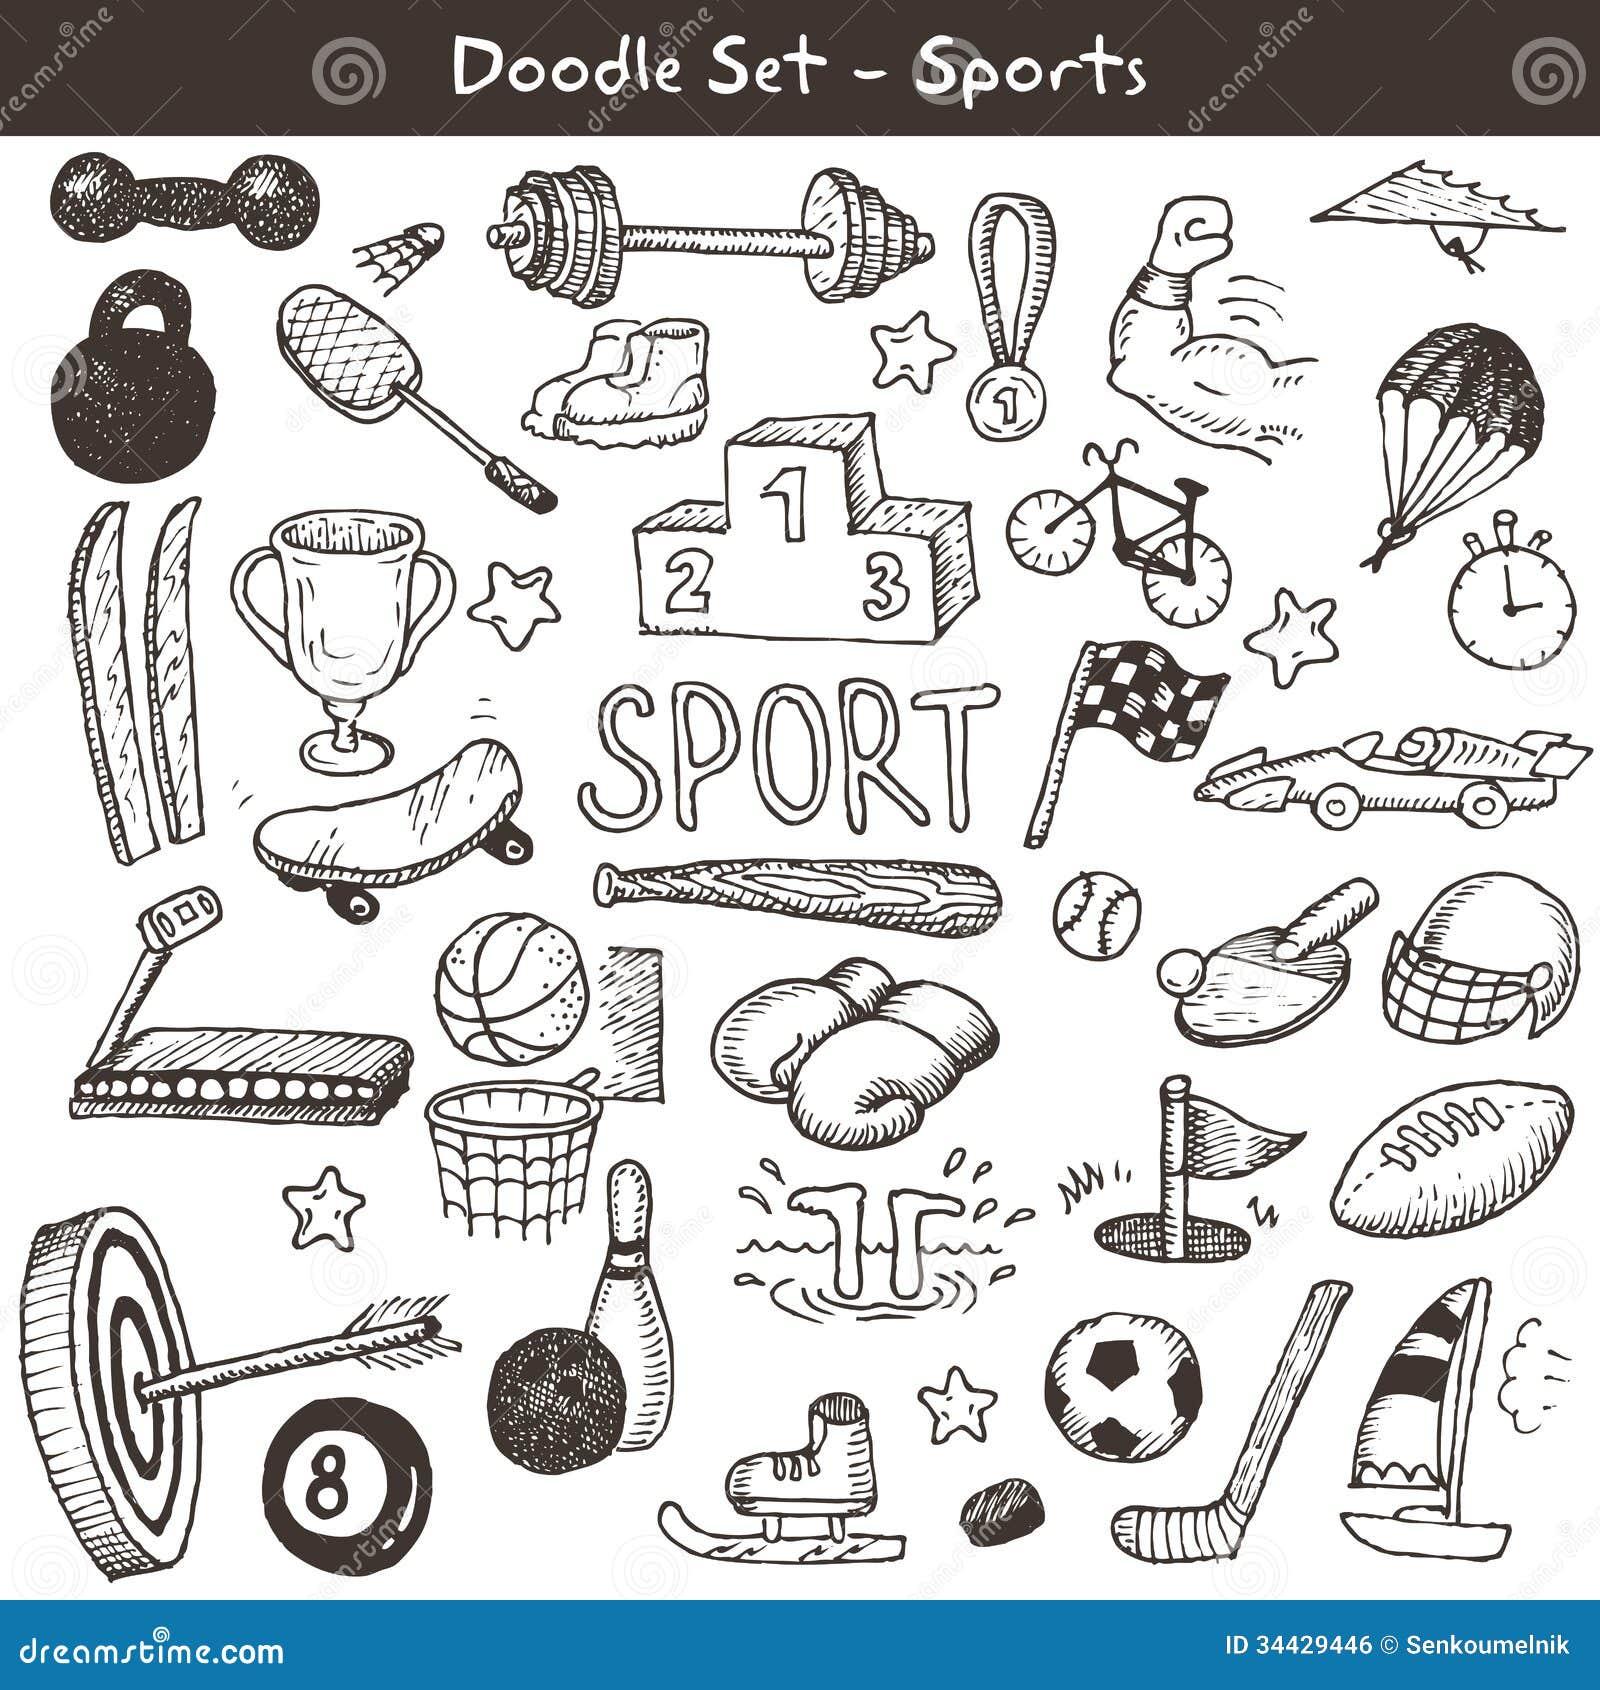 Doodle sporty.